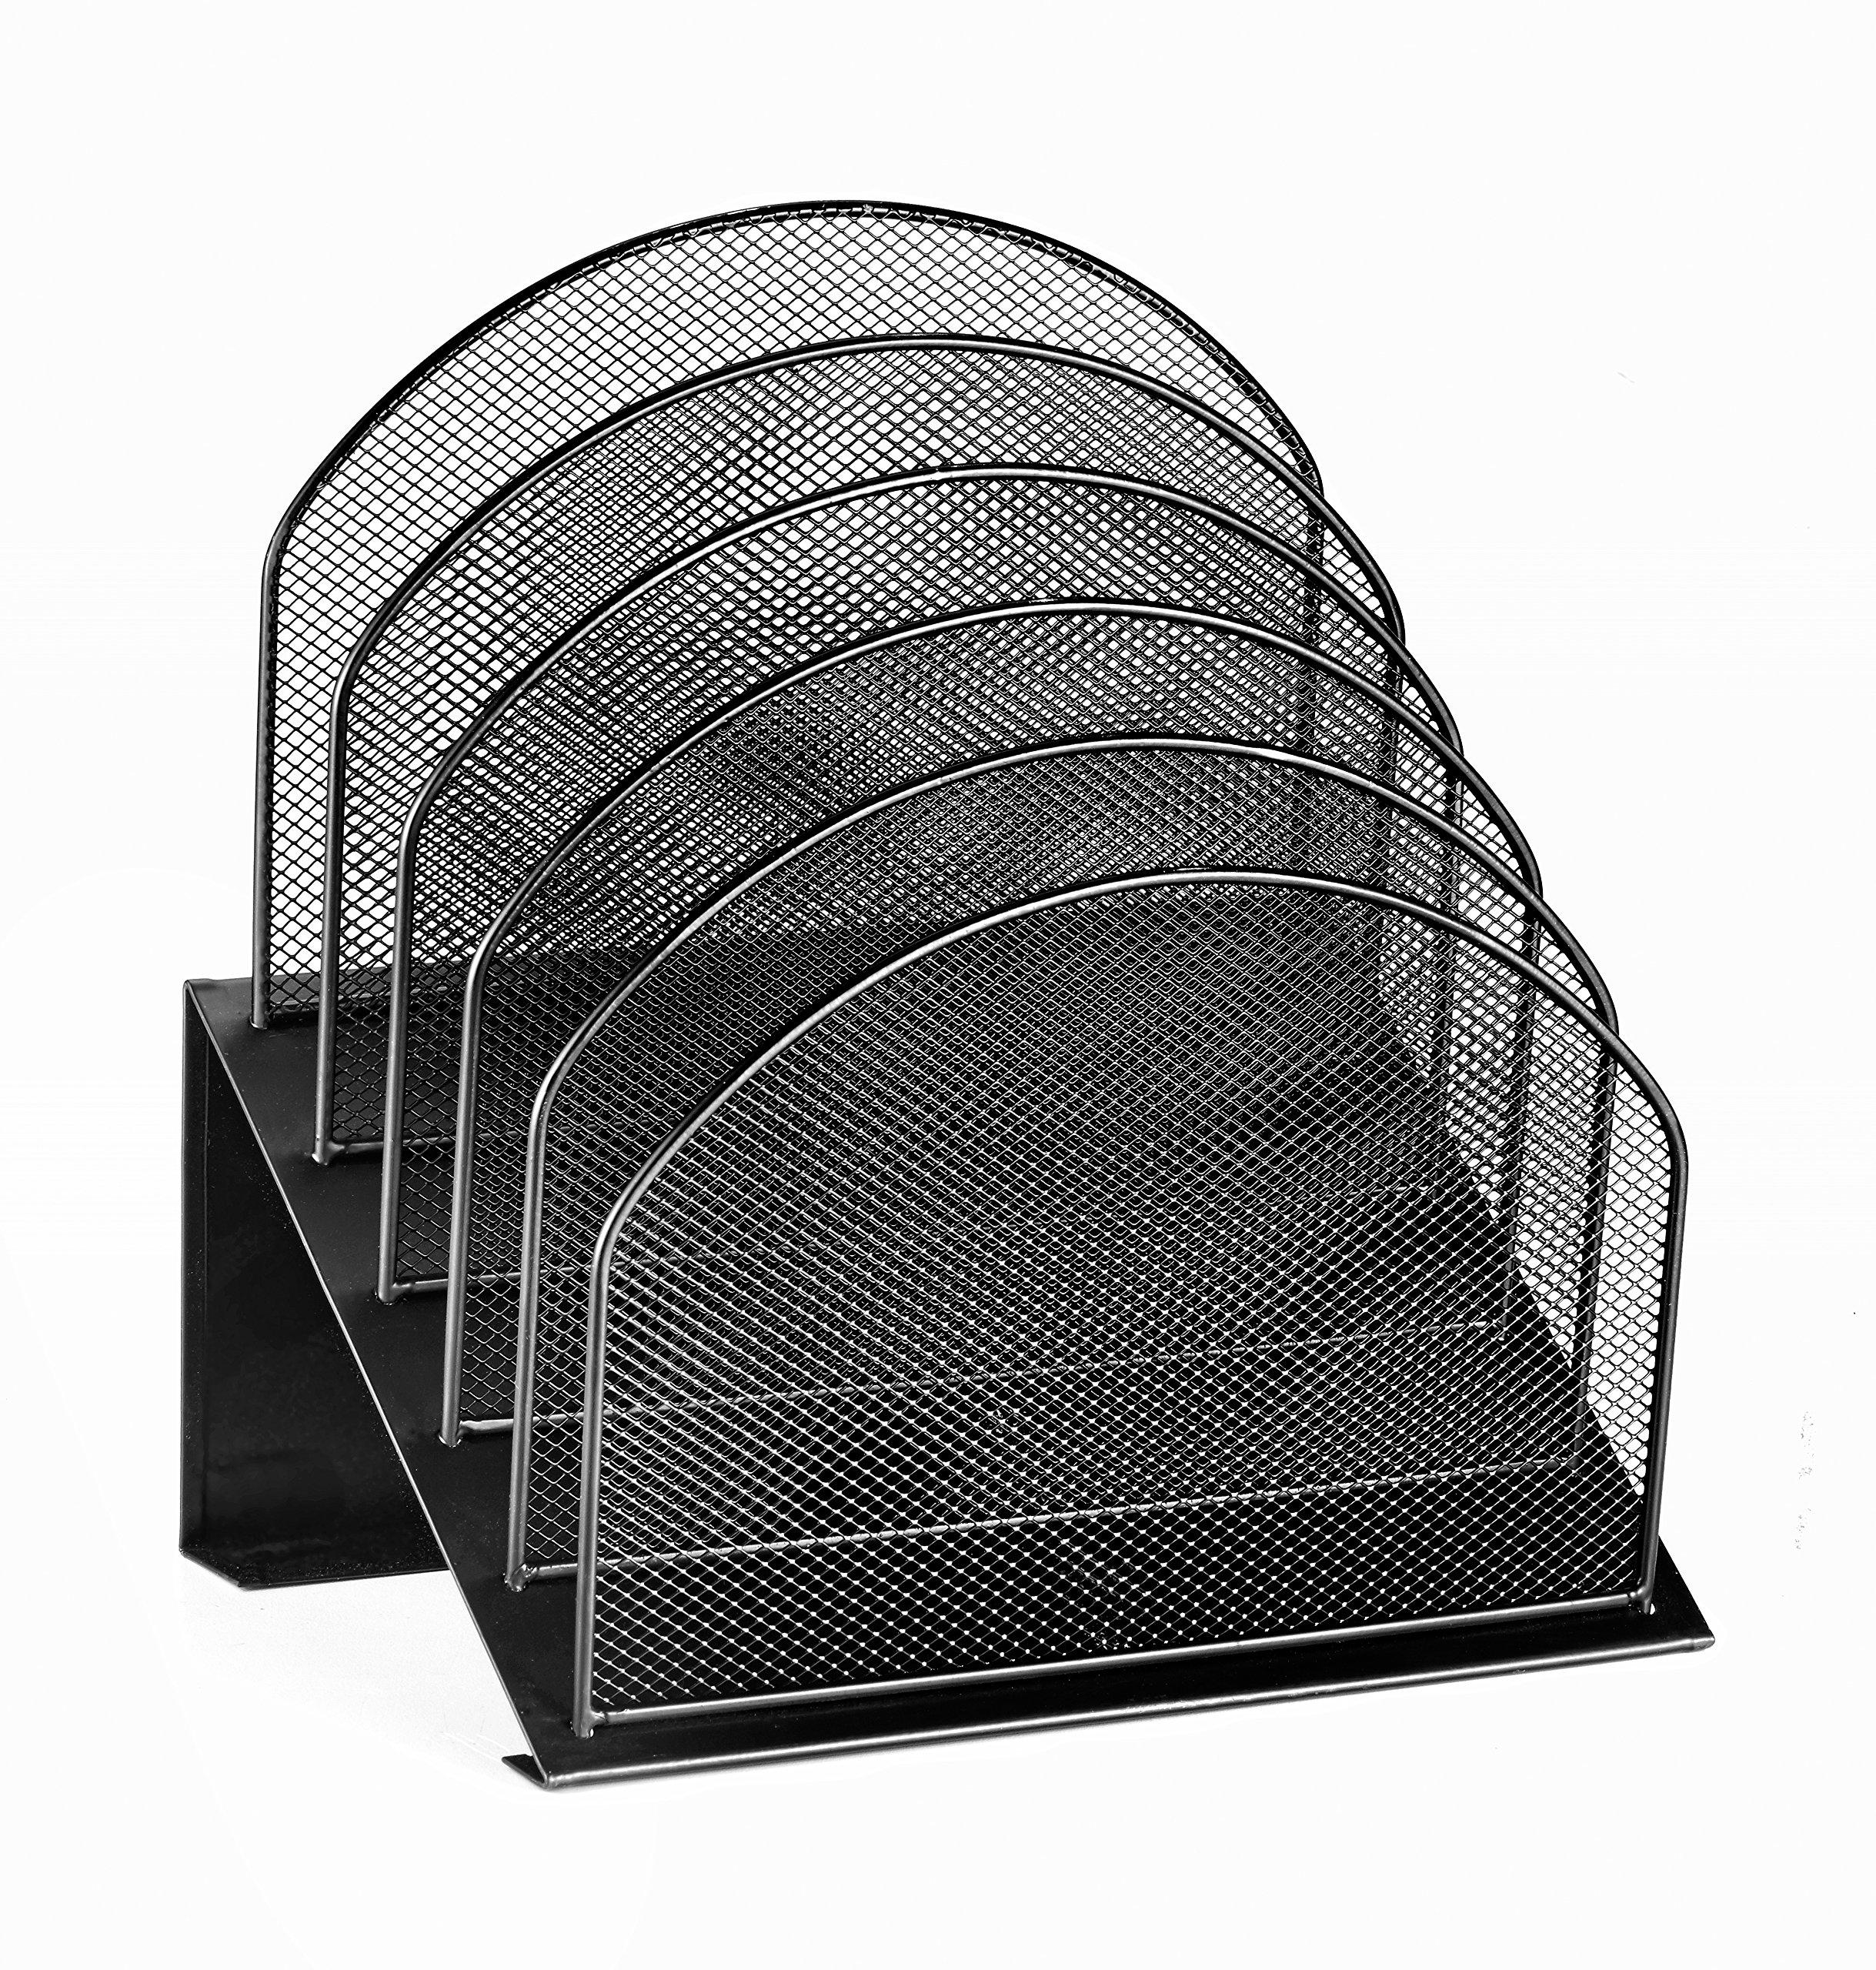 AdirOffice Mesh 5 Slot Section Desk Organizer Sorter - Desktop Incline Caddy (Black) by AdirOffice